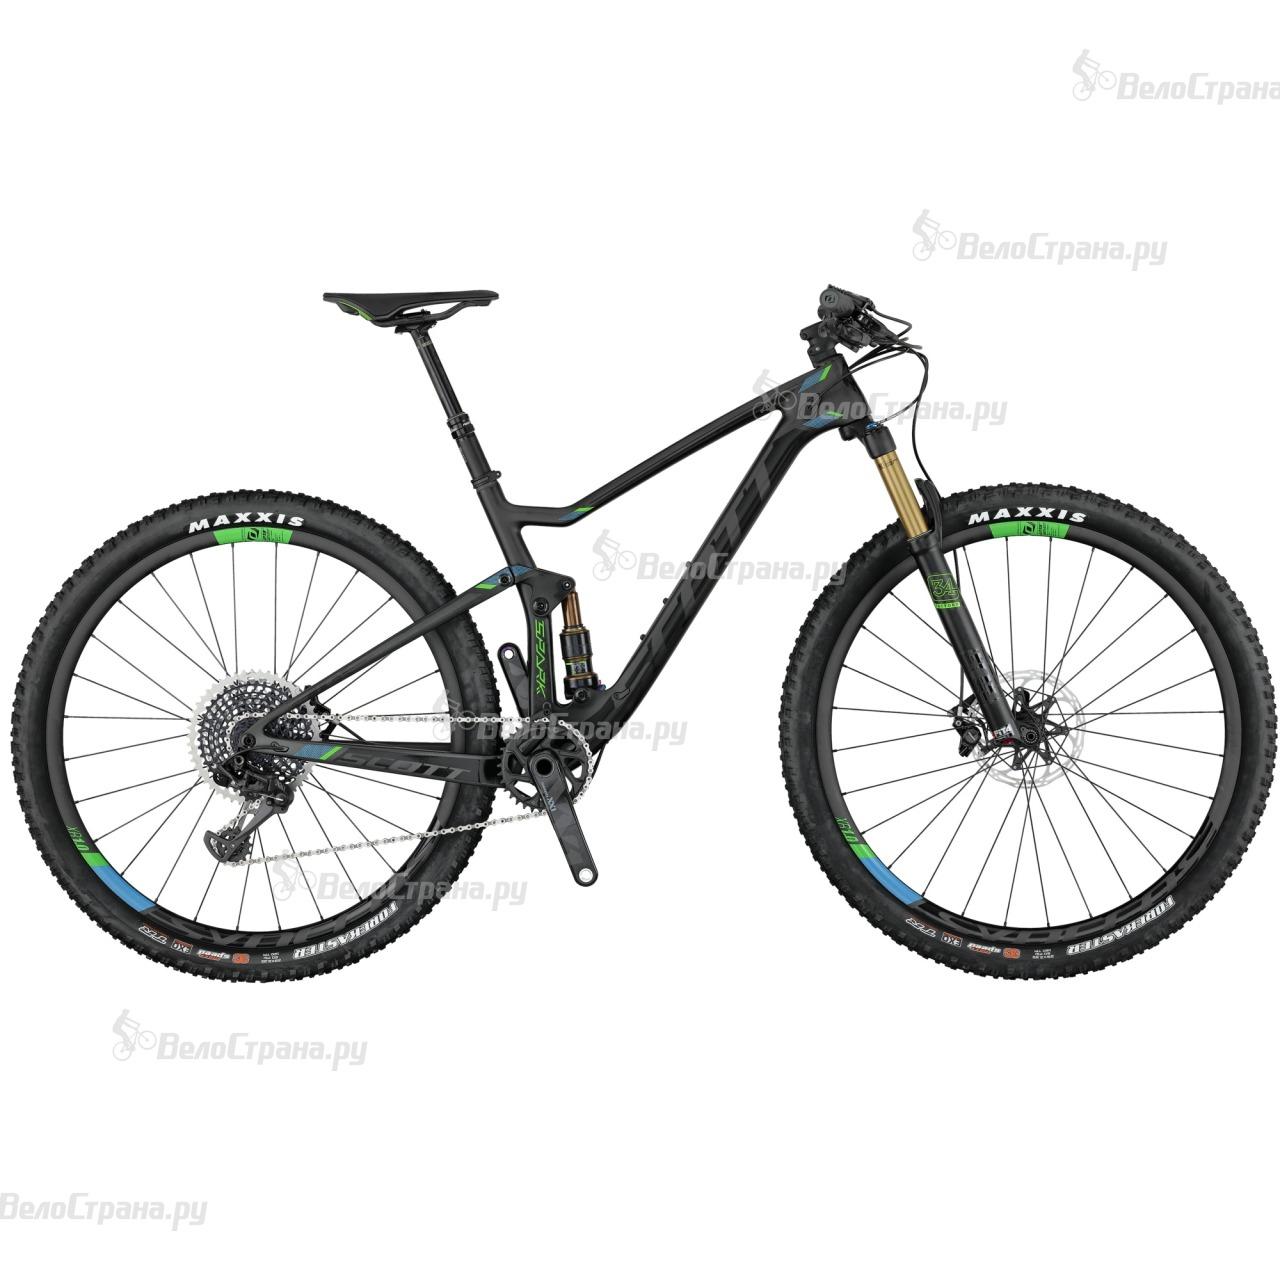 Велосипед Scott Spark 700 Ultimate (2017) велосипед scott spark 700 premium 2015